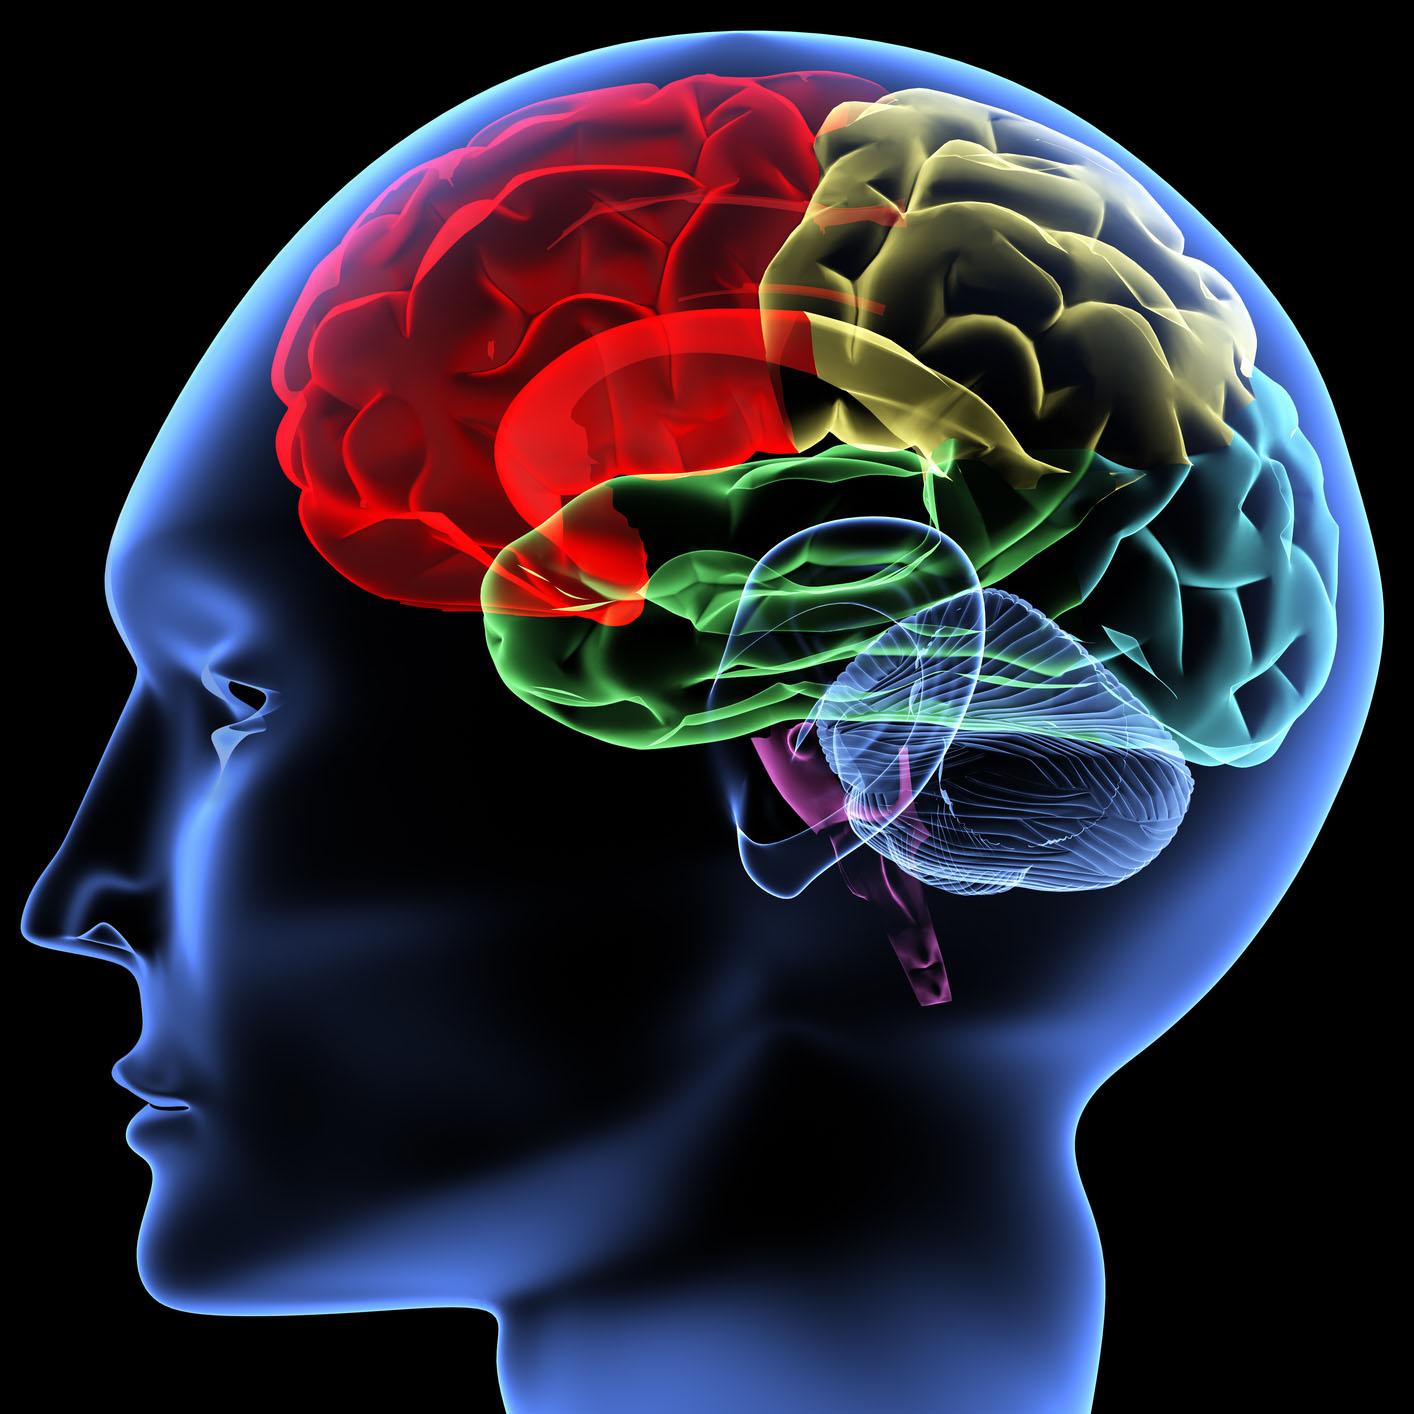 14 фактов о мозге